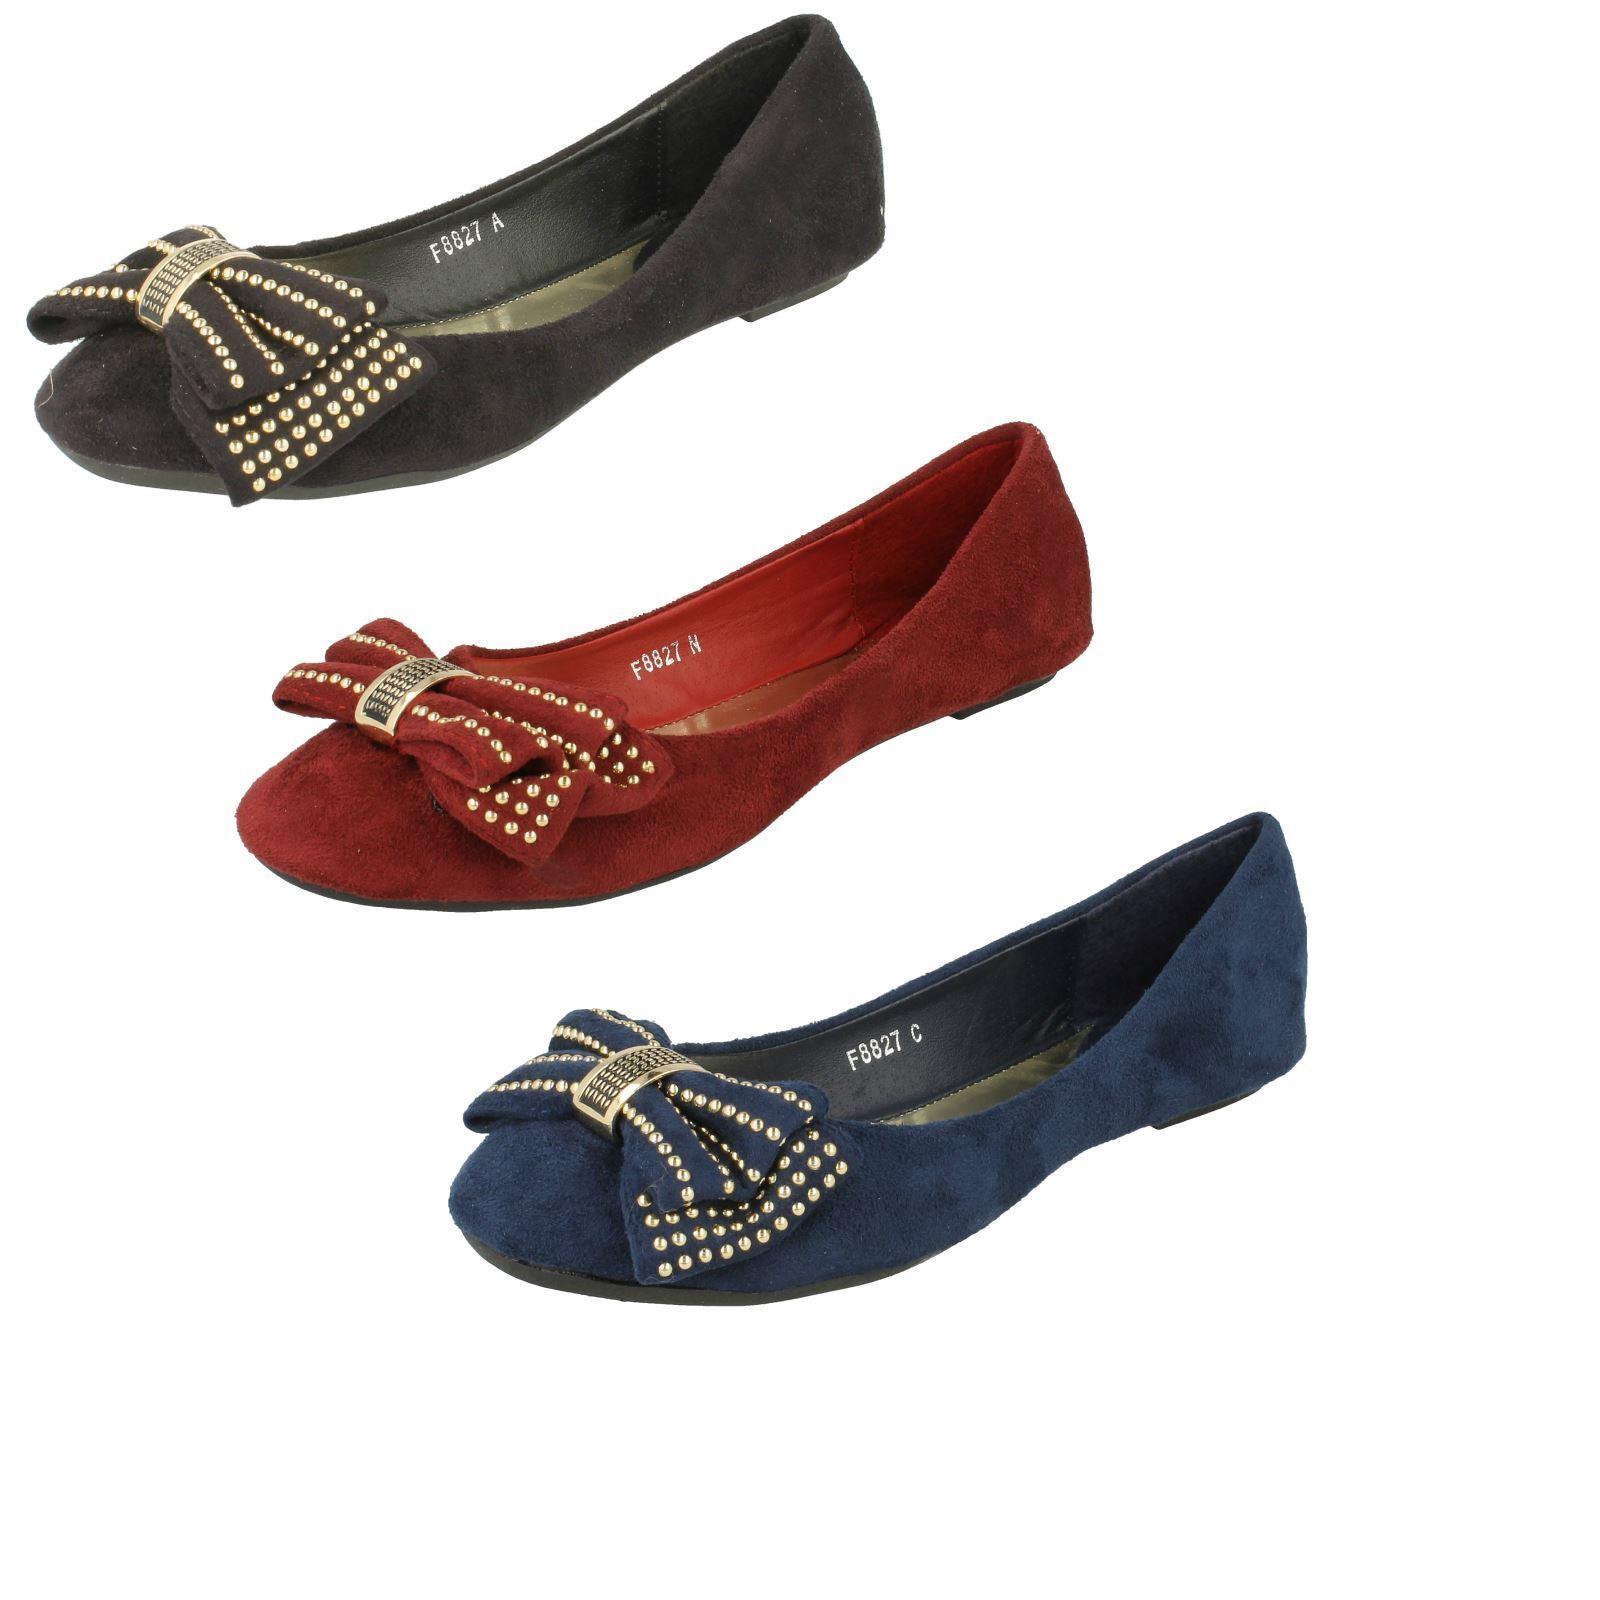 Mujer Spot On f8r827 Sin Cordones zapatos LAZO Planos Casual  zapatos Cordones  Bailarinas 57be8e